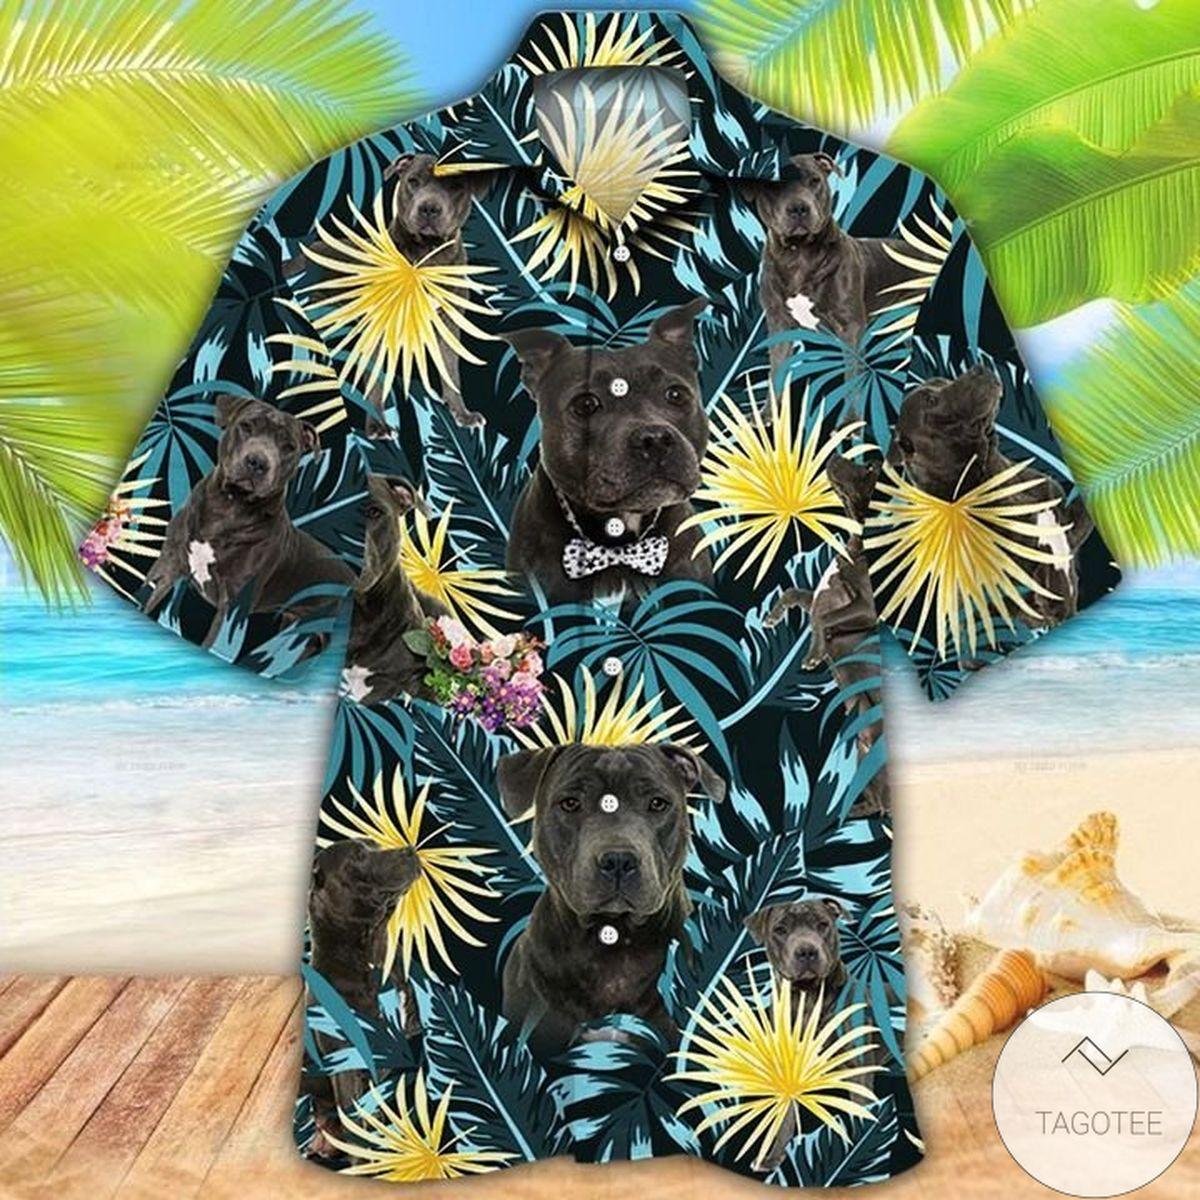 Free Staffordshire Bull Terrier Dog Lovers Blue And Yellow Plants Hawaiian Shirt